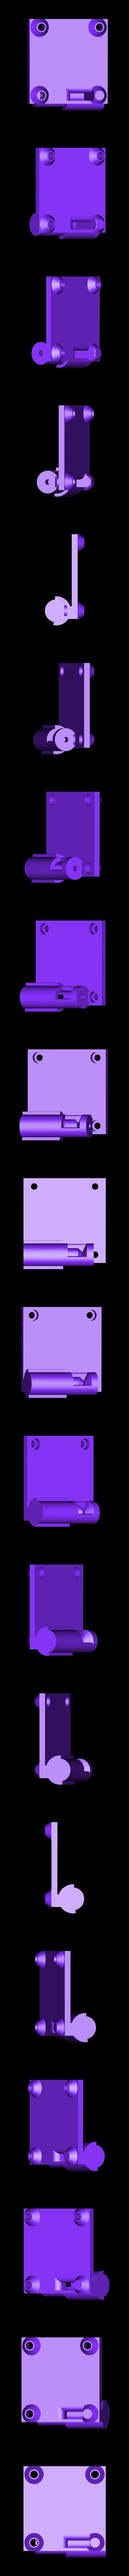 HINGE_BODY.stl Télécharger fichier STL gratuit Moniteur OLED OctoPi [WemOled] • Plan imprimable en 3D, theveel